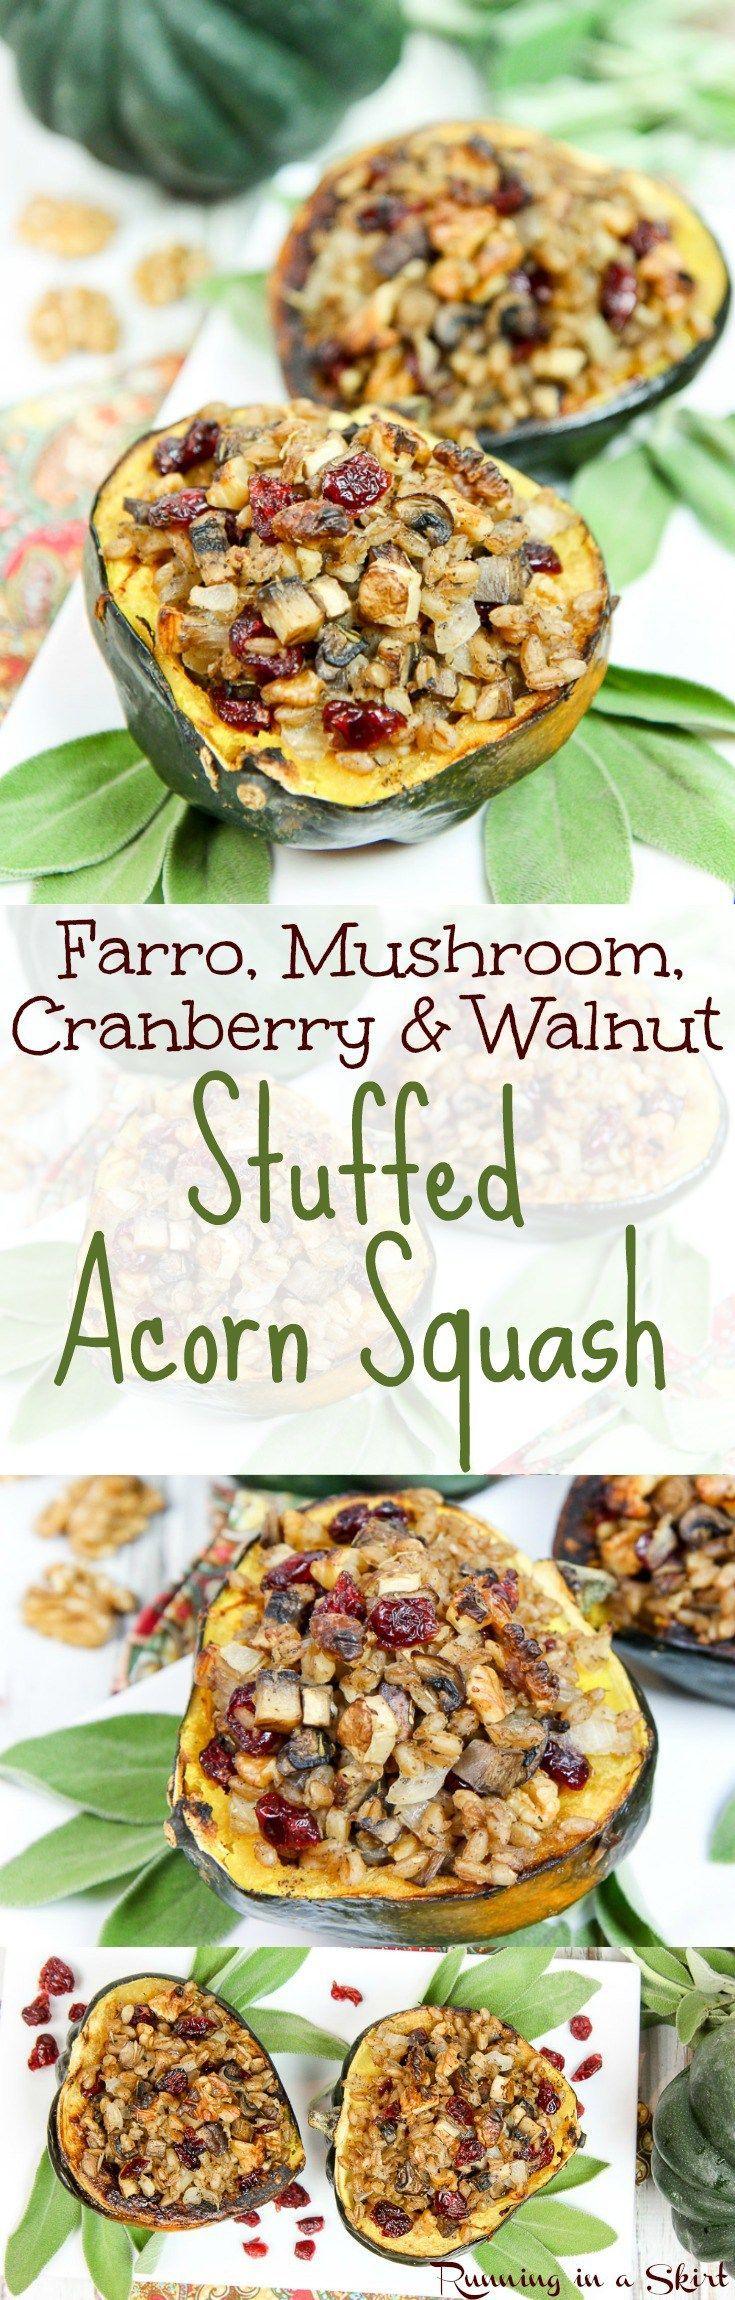 vegan-vegetarian-stuffed-acorn-squash-recipe